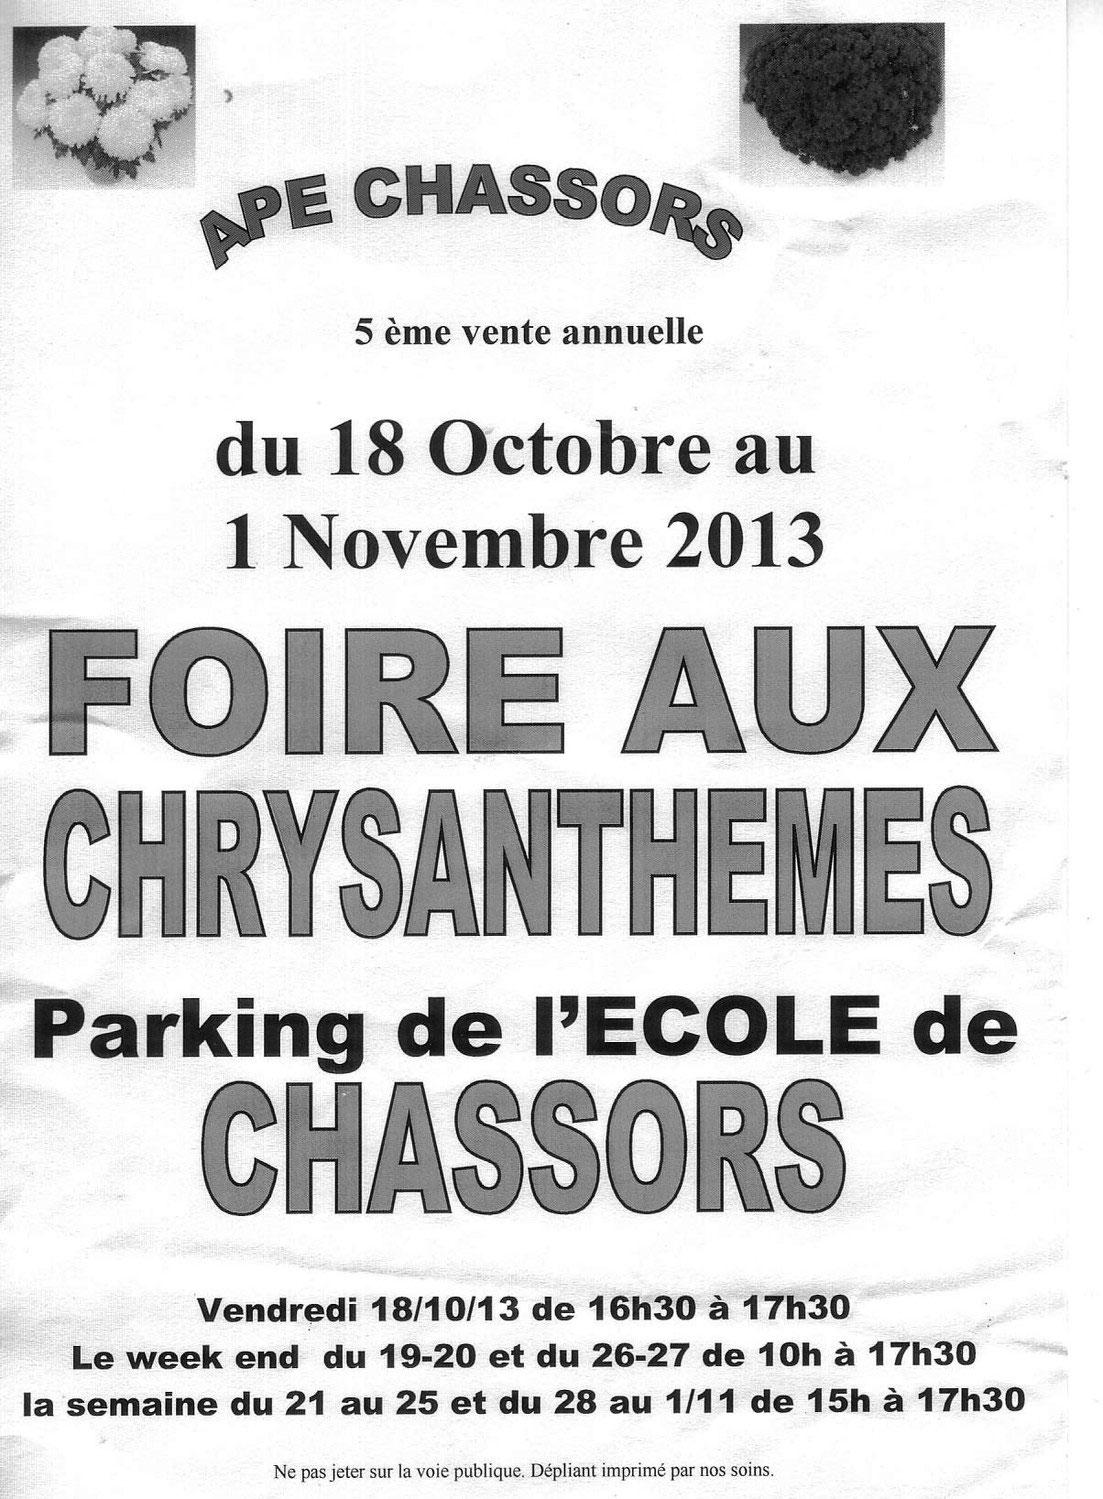 Calendrier Collecte Calitom.Jeudi 23 Janvier 2014 A 19h00 Mme Le Maire Presente Ses